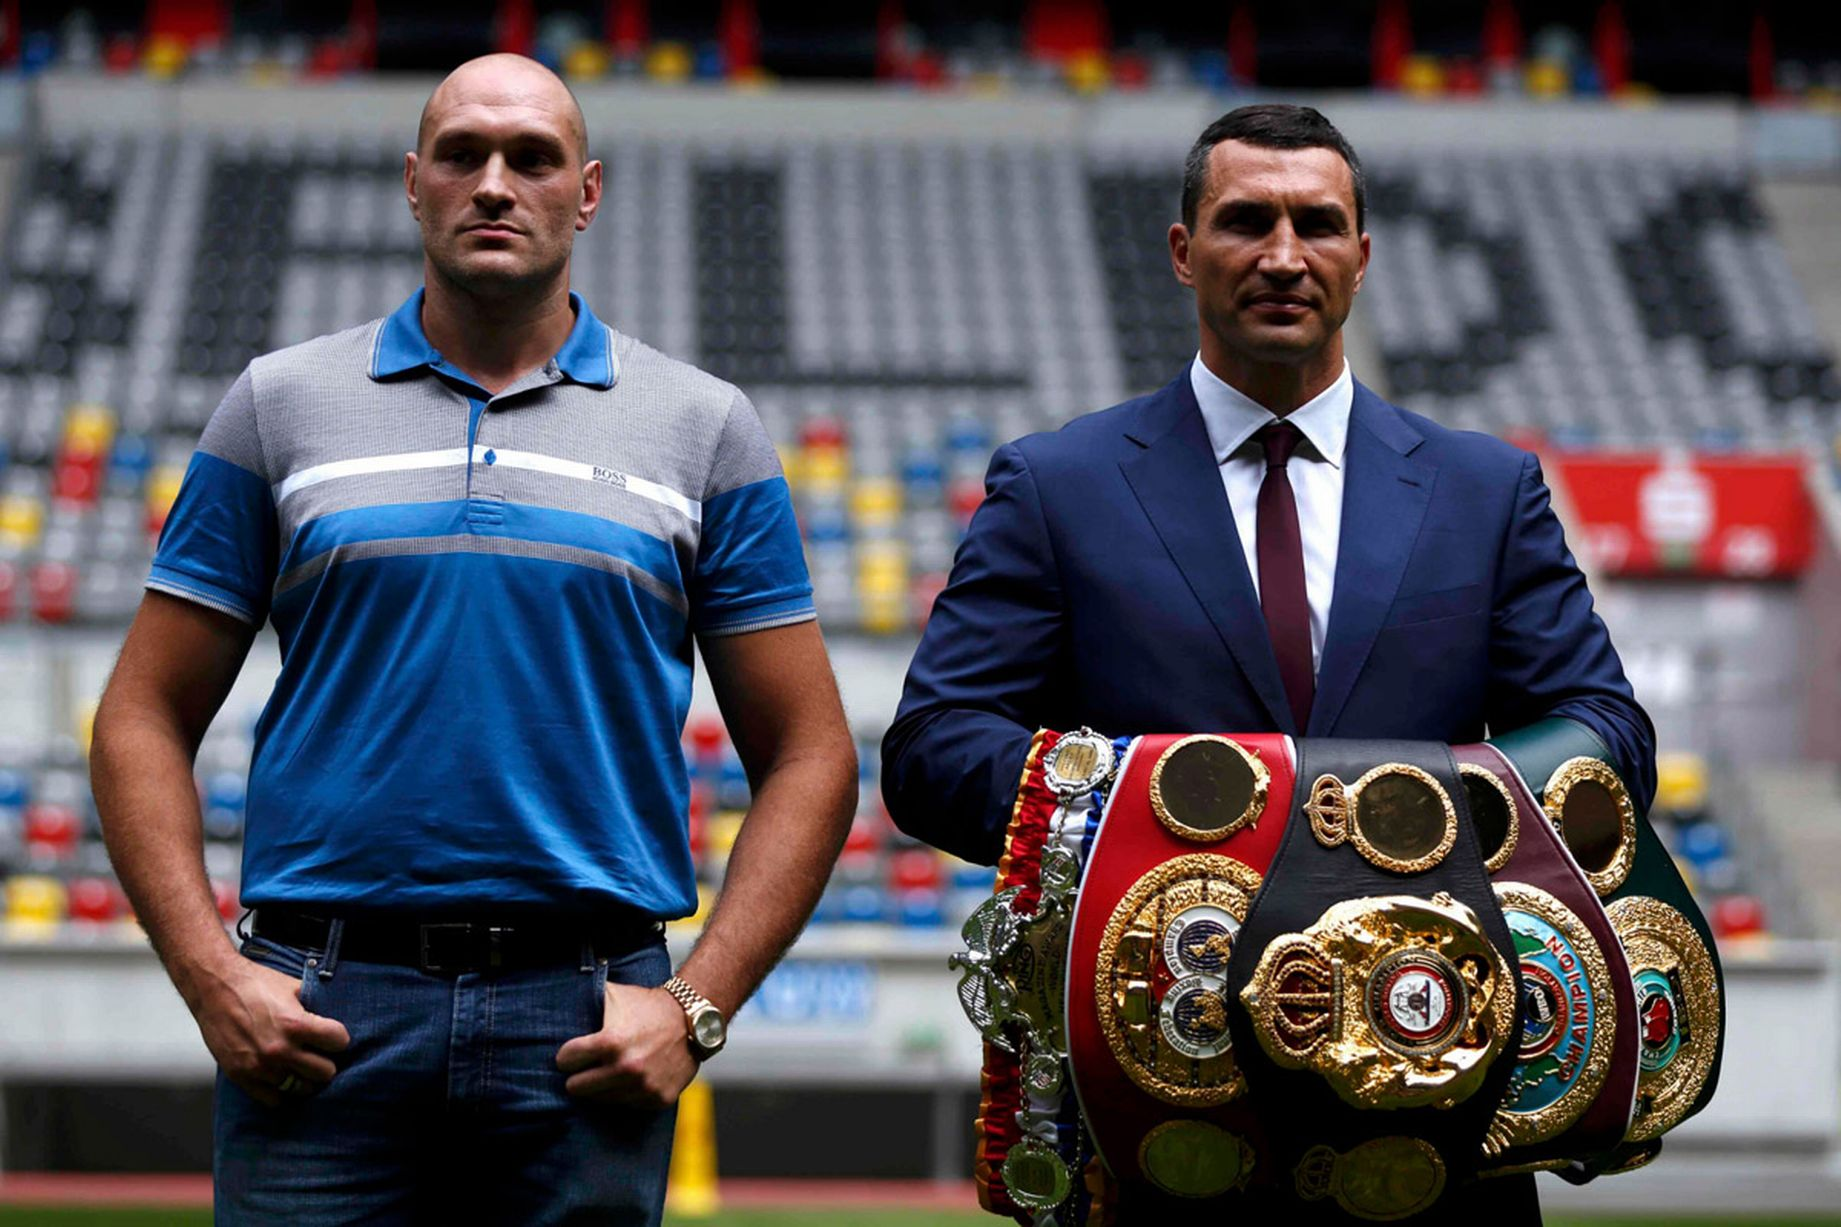 Wladimir Klitschko vs. Tyson Fury Rescheduled: New Date, Location and More